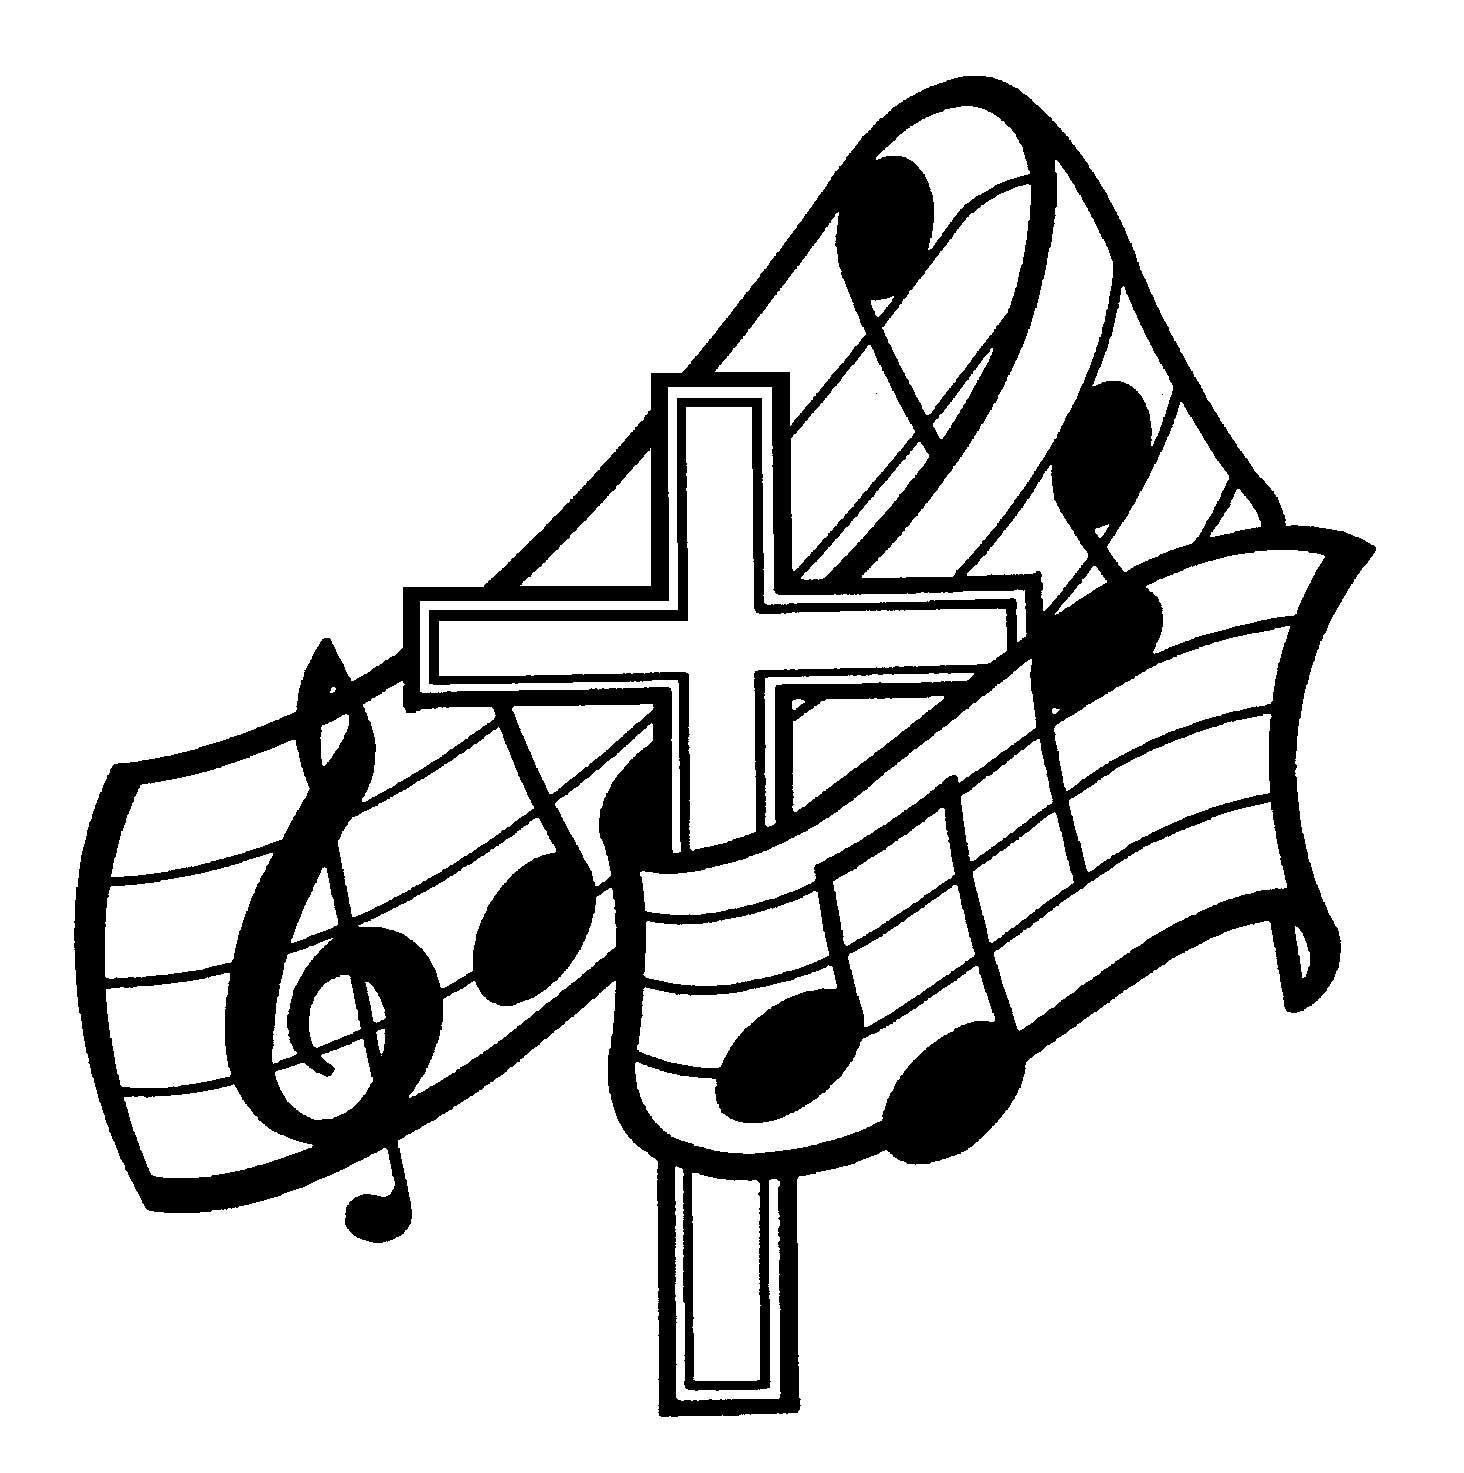 Christian choir room ministry. Clipart music church